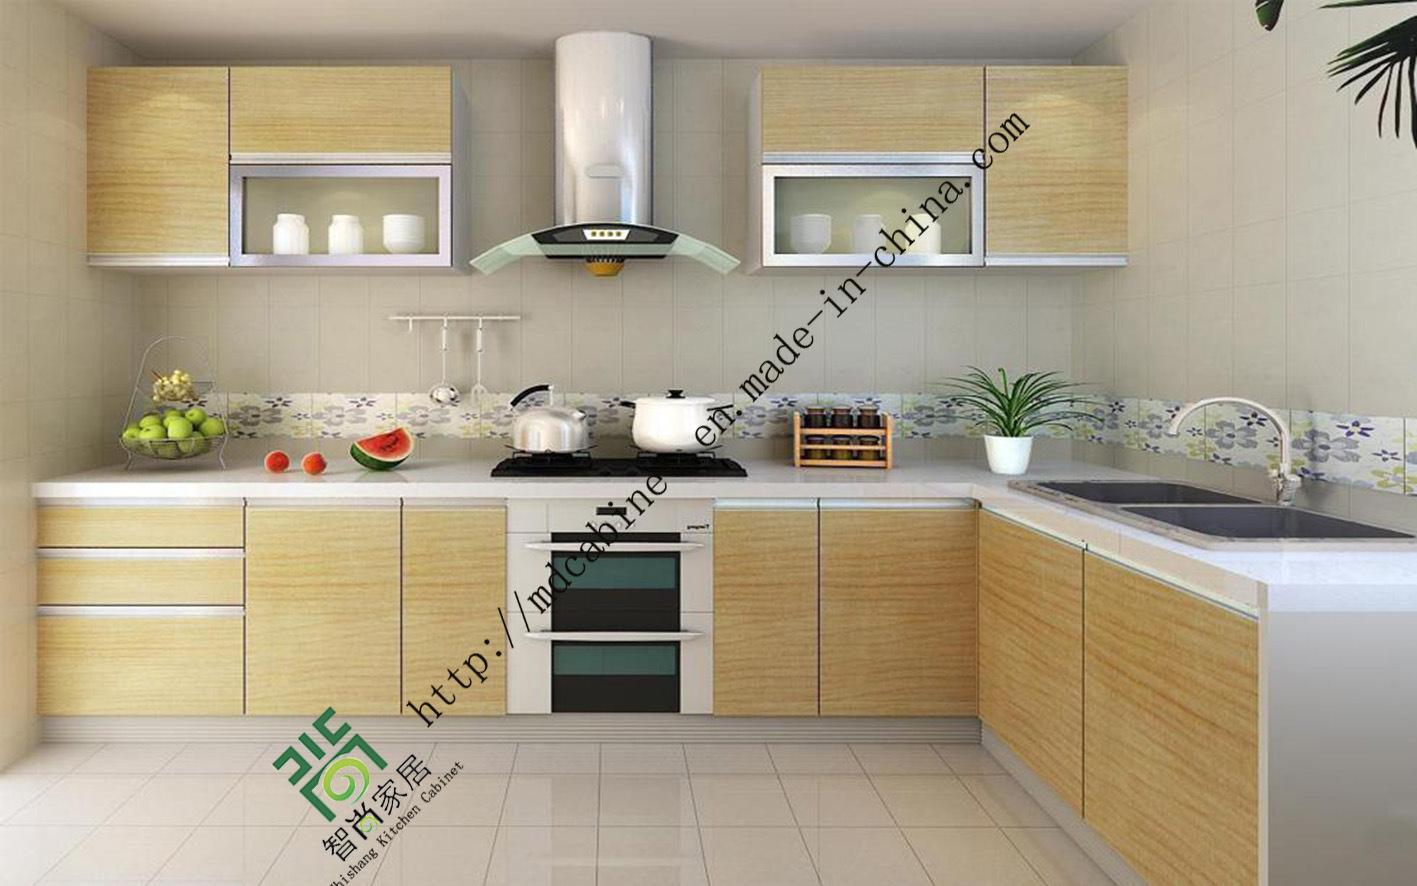 China 2016 New Design UV Kitchen Cabinet (zs-156) - China ...